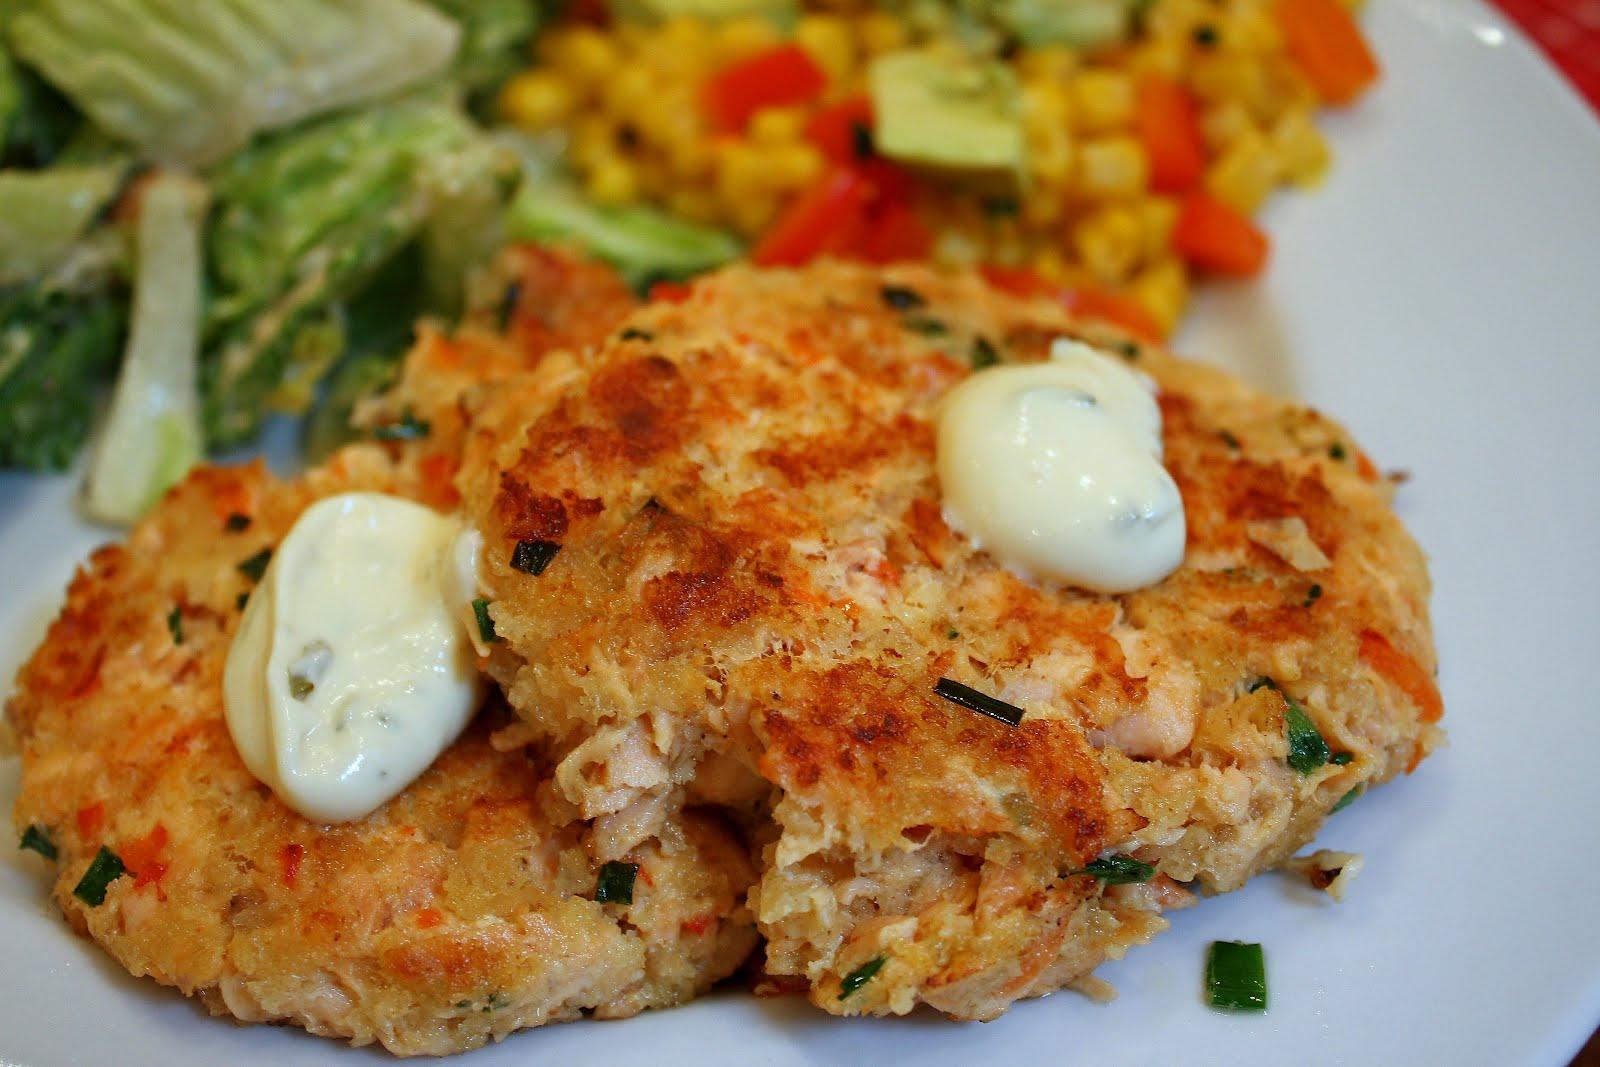 Elizabeth's Edible Experience: Forgotten Fish